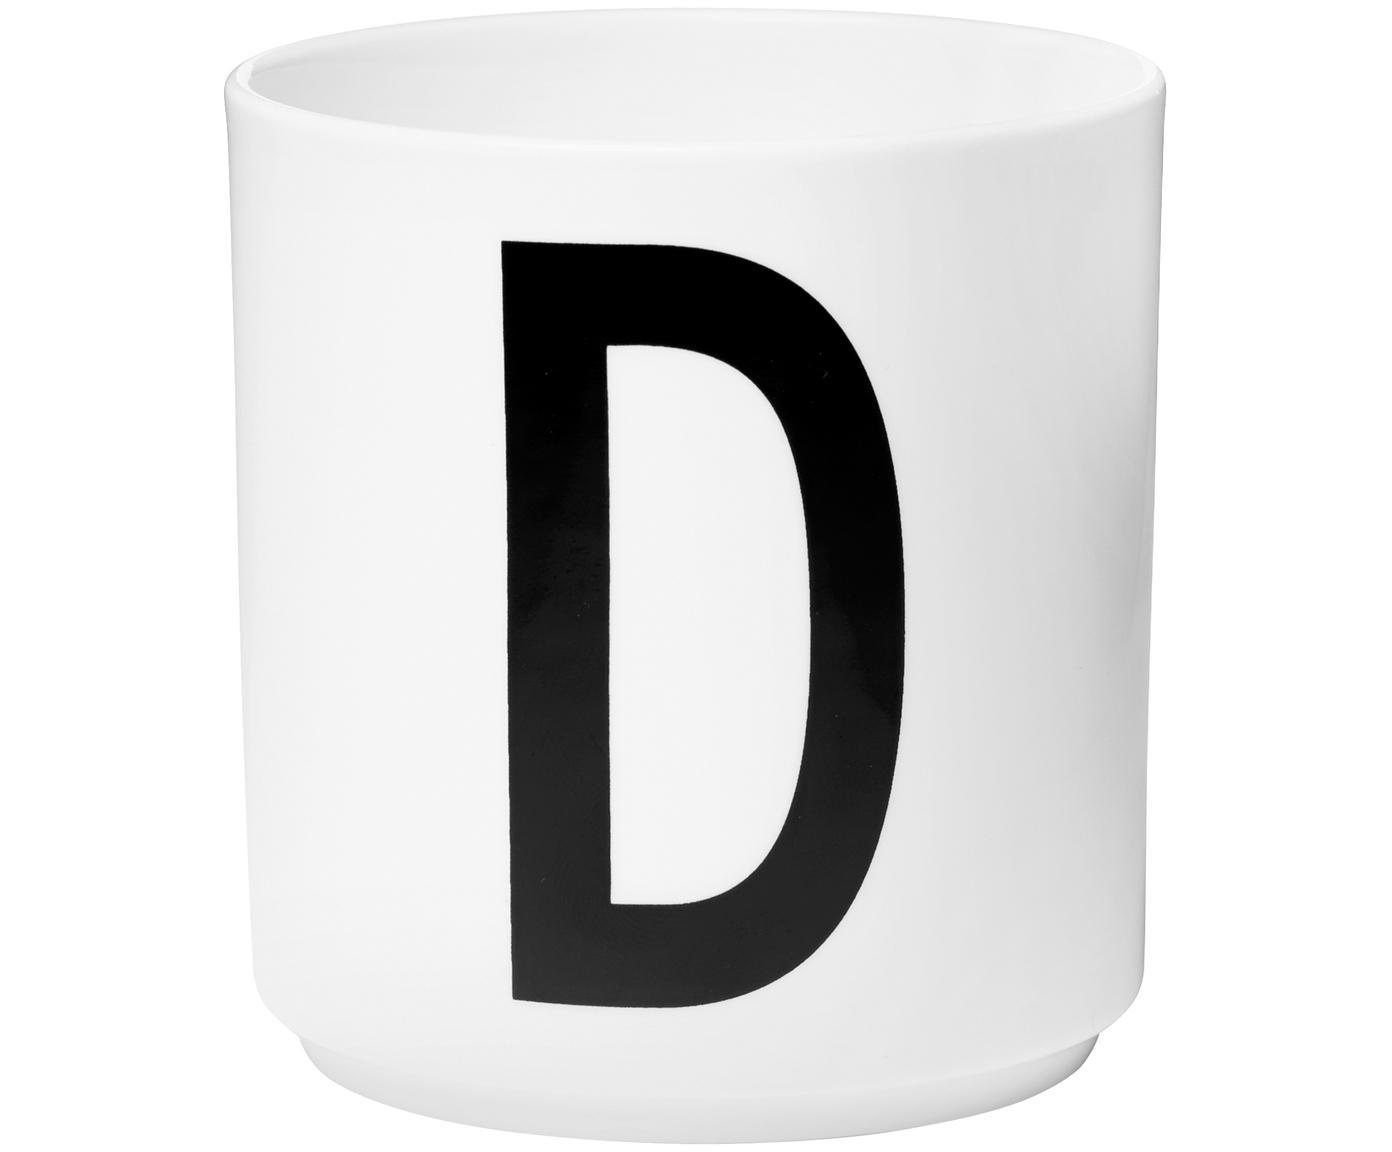 Beker Personal (varianten van A tot Z), Fine Bone China, Wit, zwart, Beker D